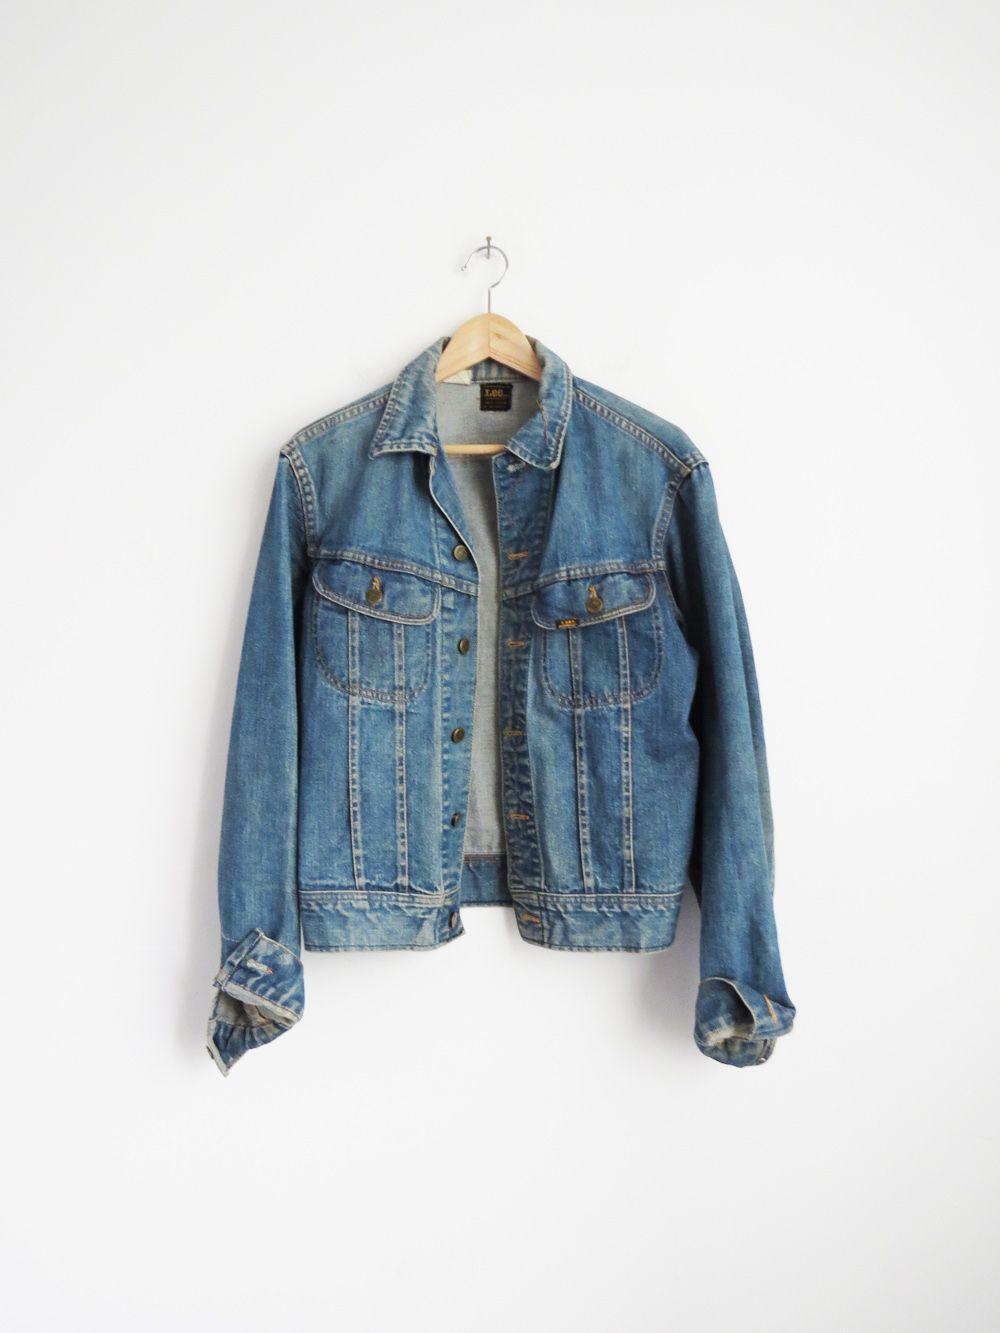 Lee Denim Jacket Vintage Jean Jacket Sold Lee Denim Jacket Vintage Denim Jacket Denim Jacket [ 1333 x 1000 Pixel ]